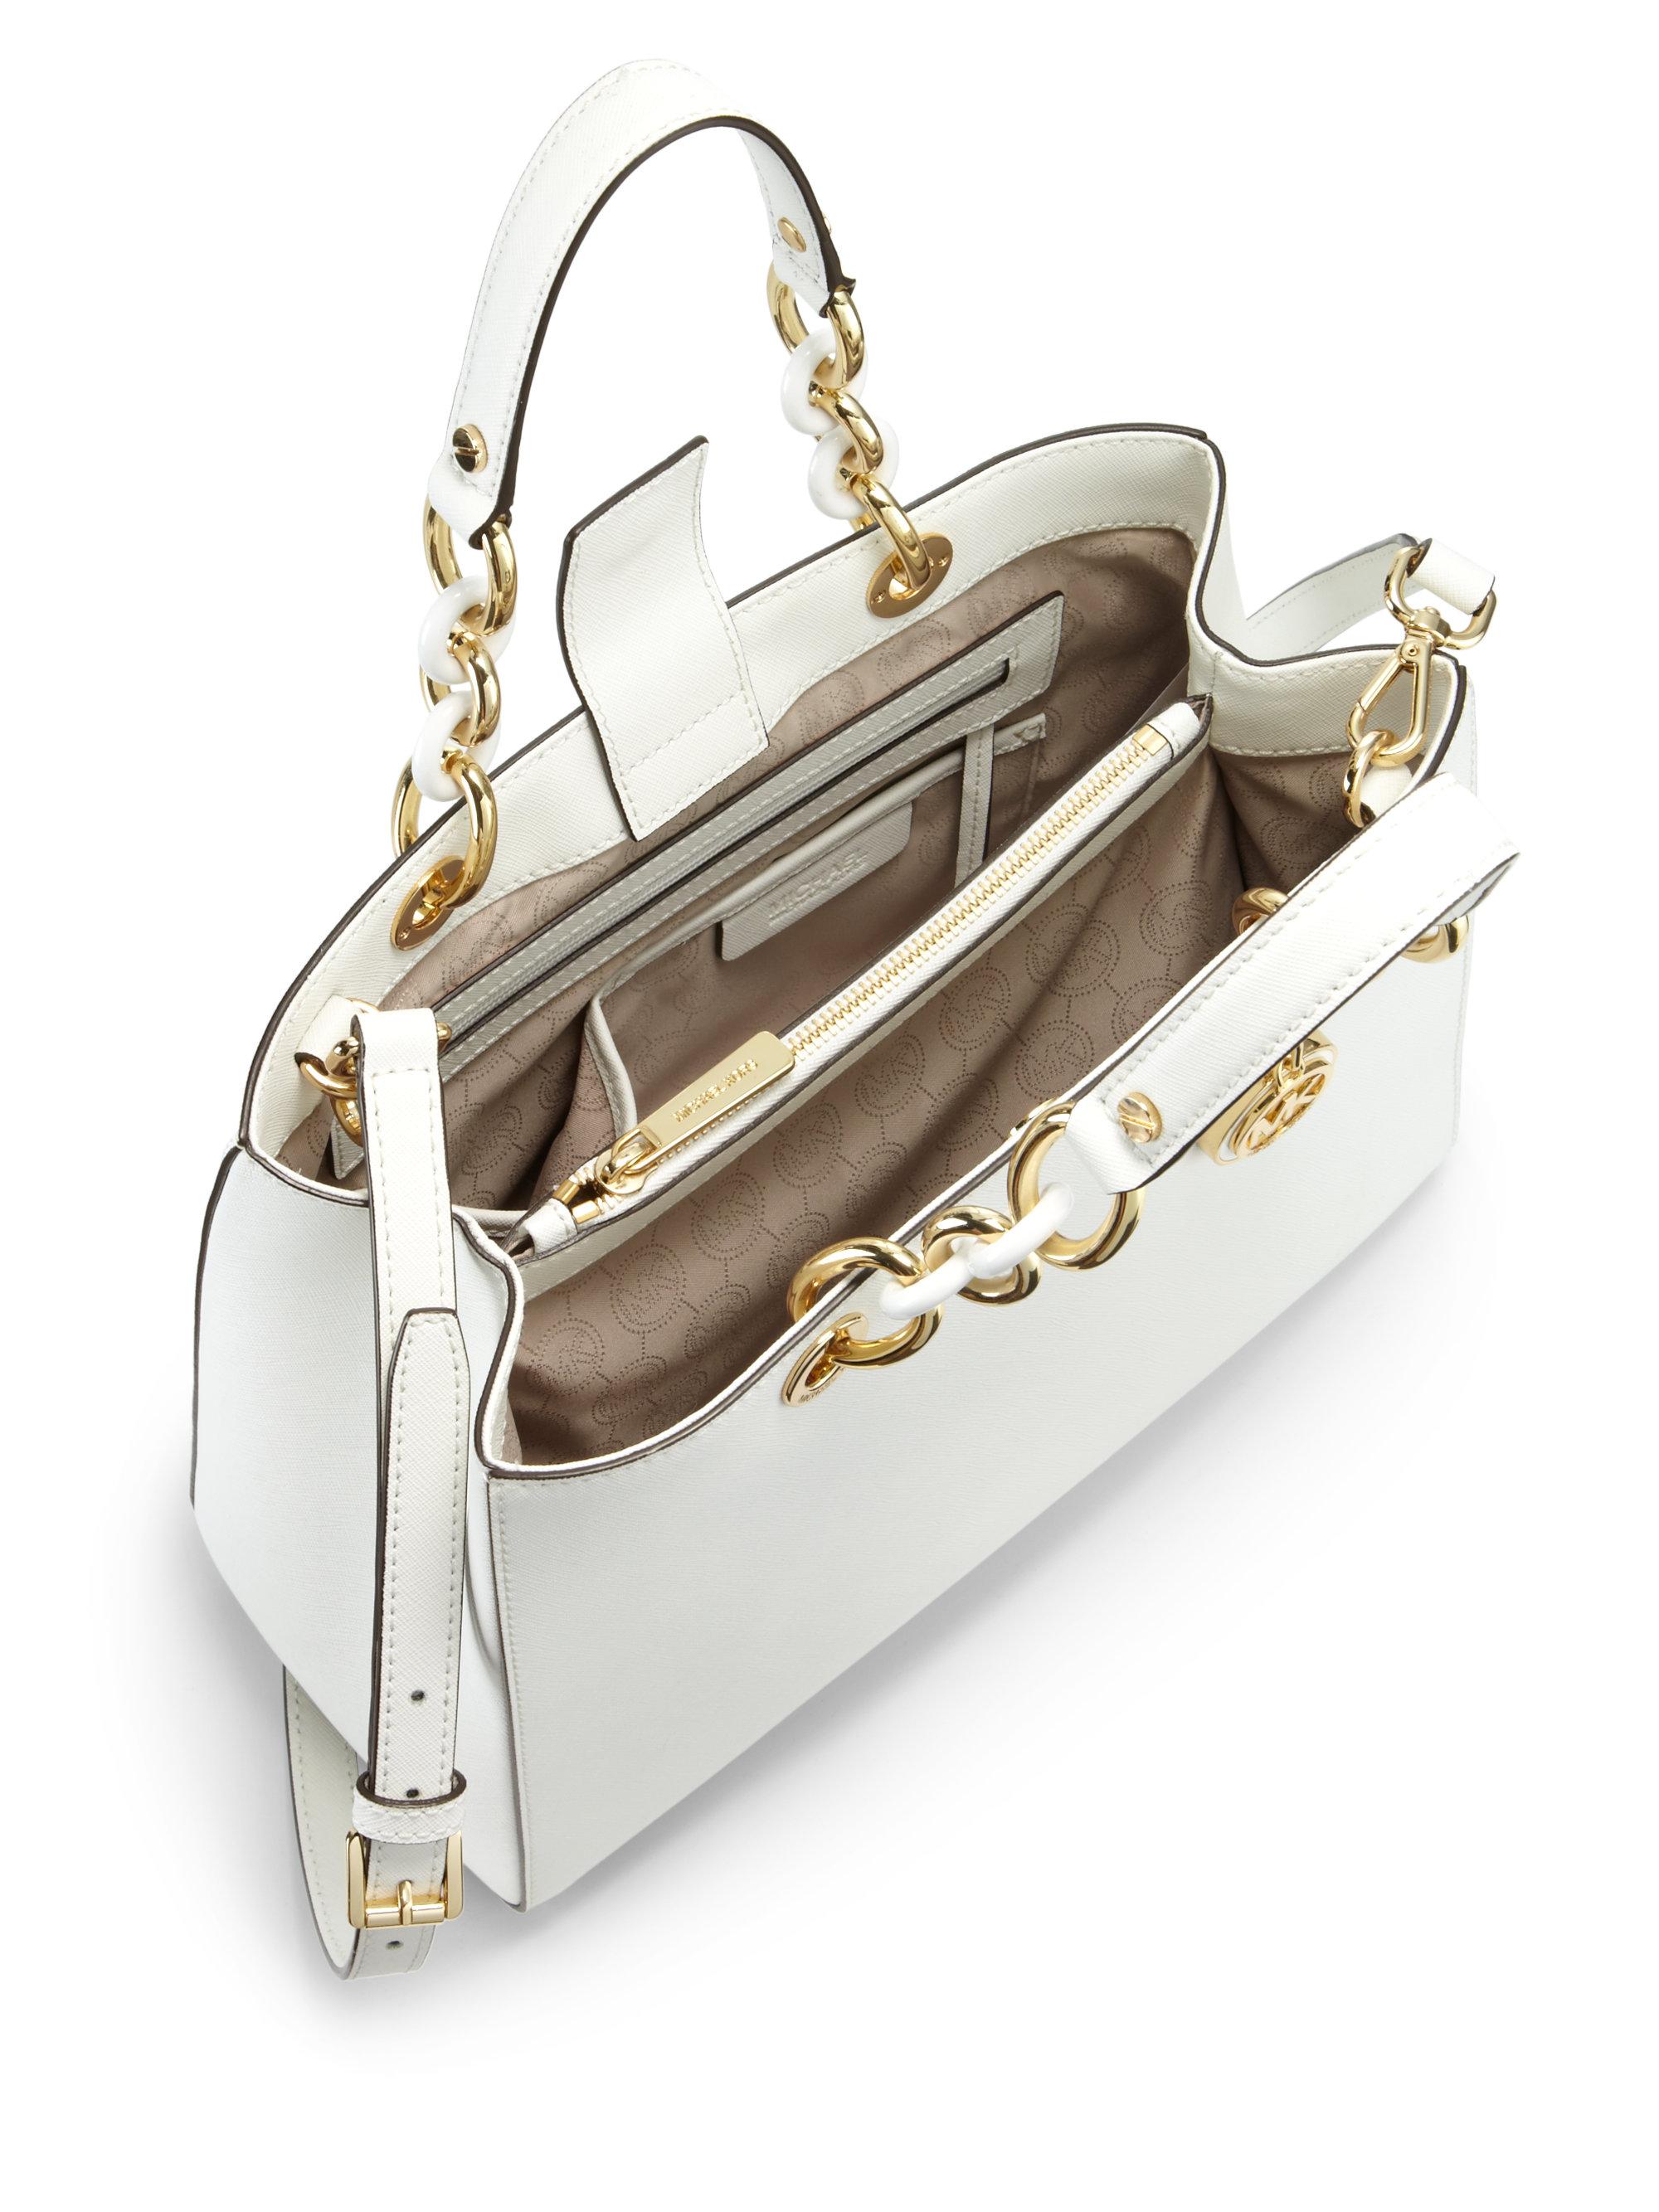 a7a06d4f375a france michael kors satchel in pale blue d22a0 473ec; sale lyst michael  michael kors cynthia medium satchel in white a310d f6291